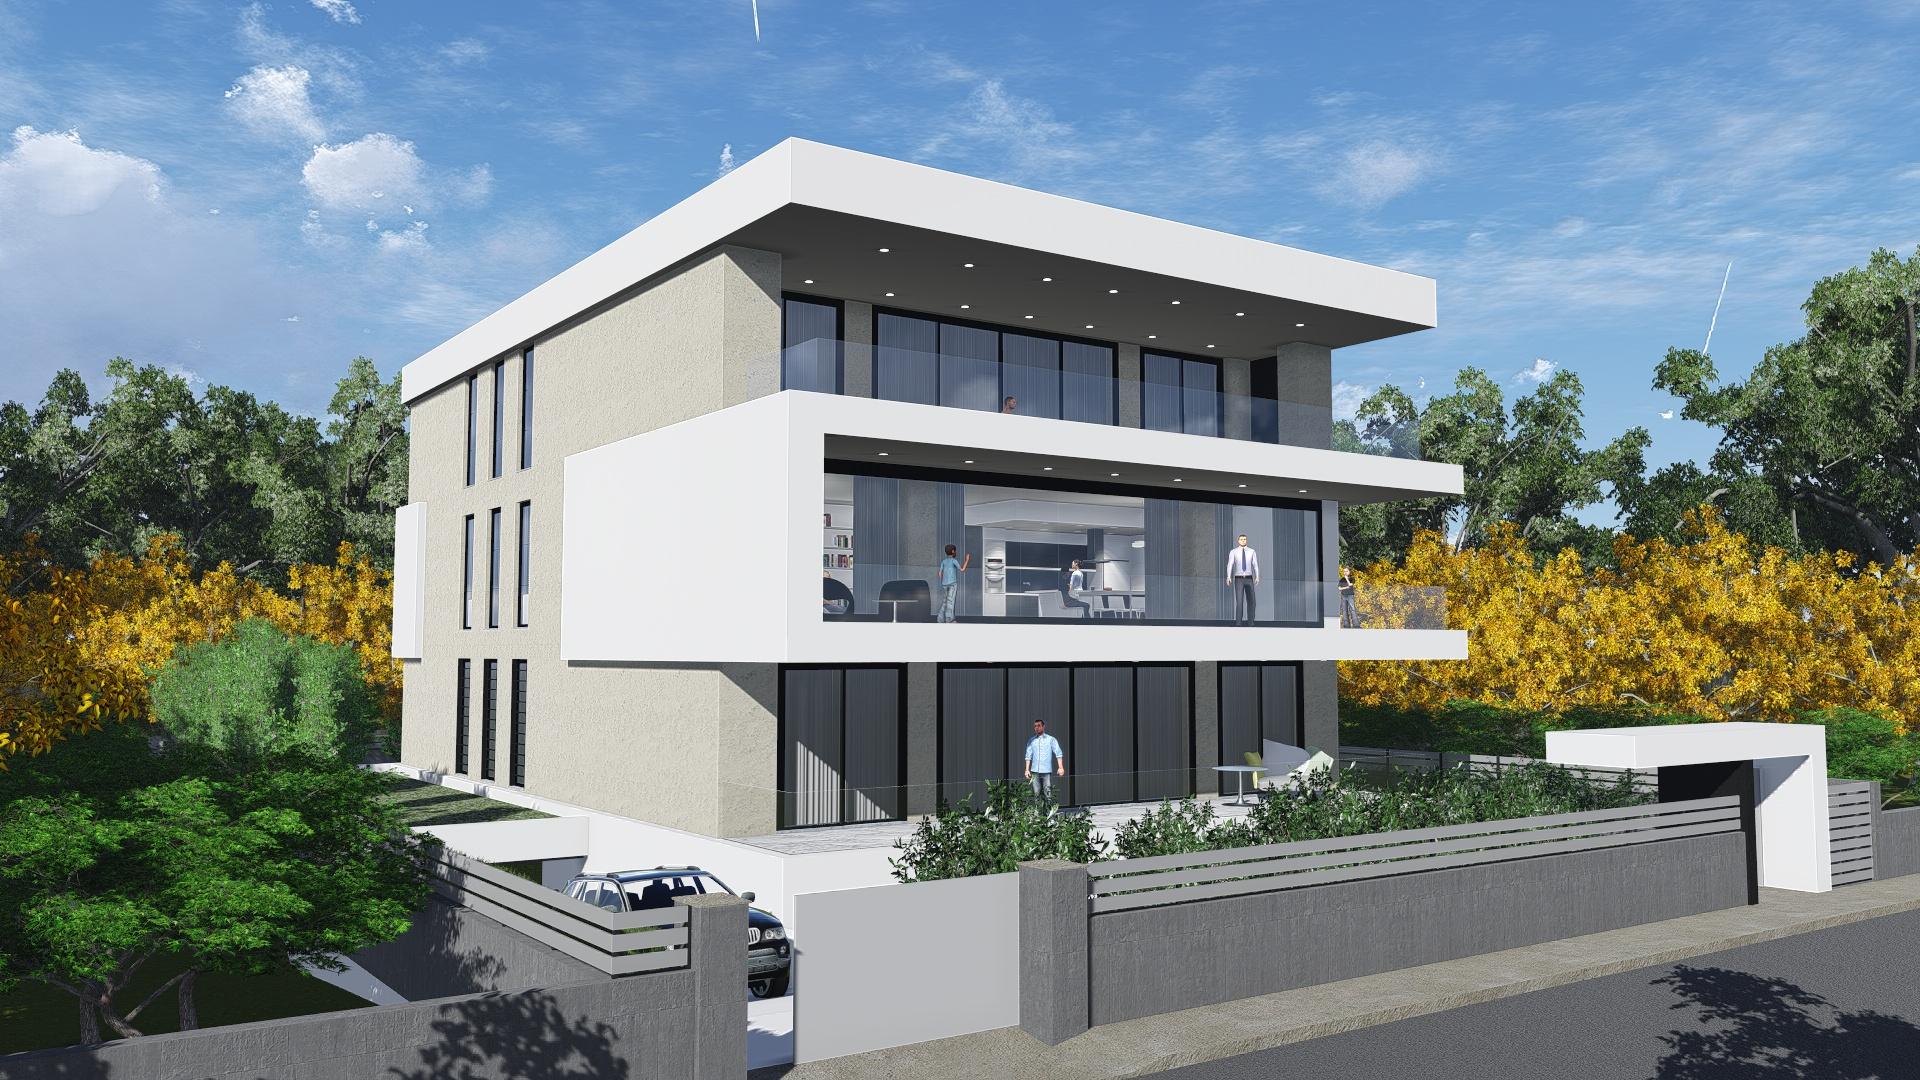 3 Apartments Building